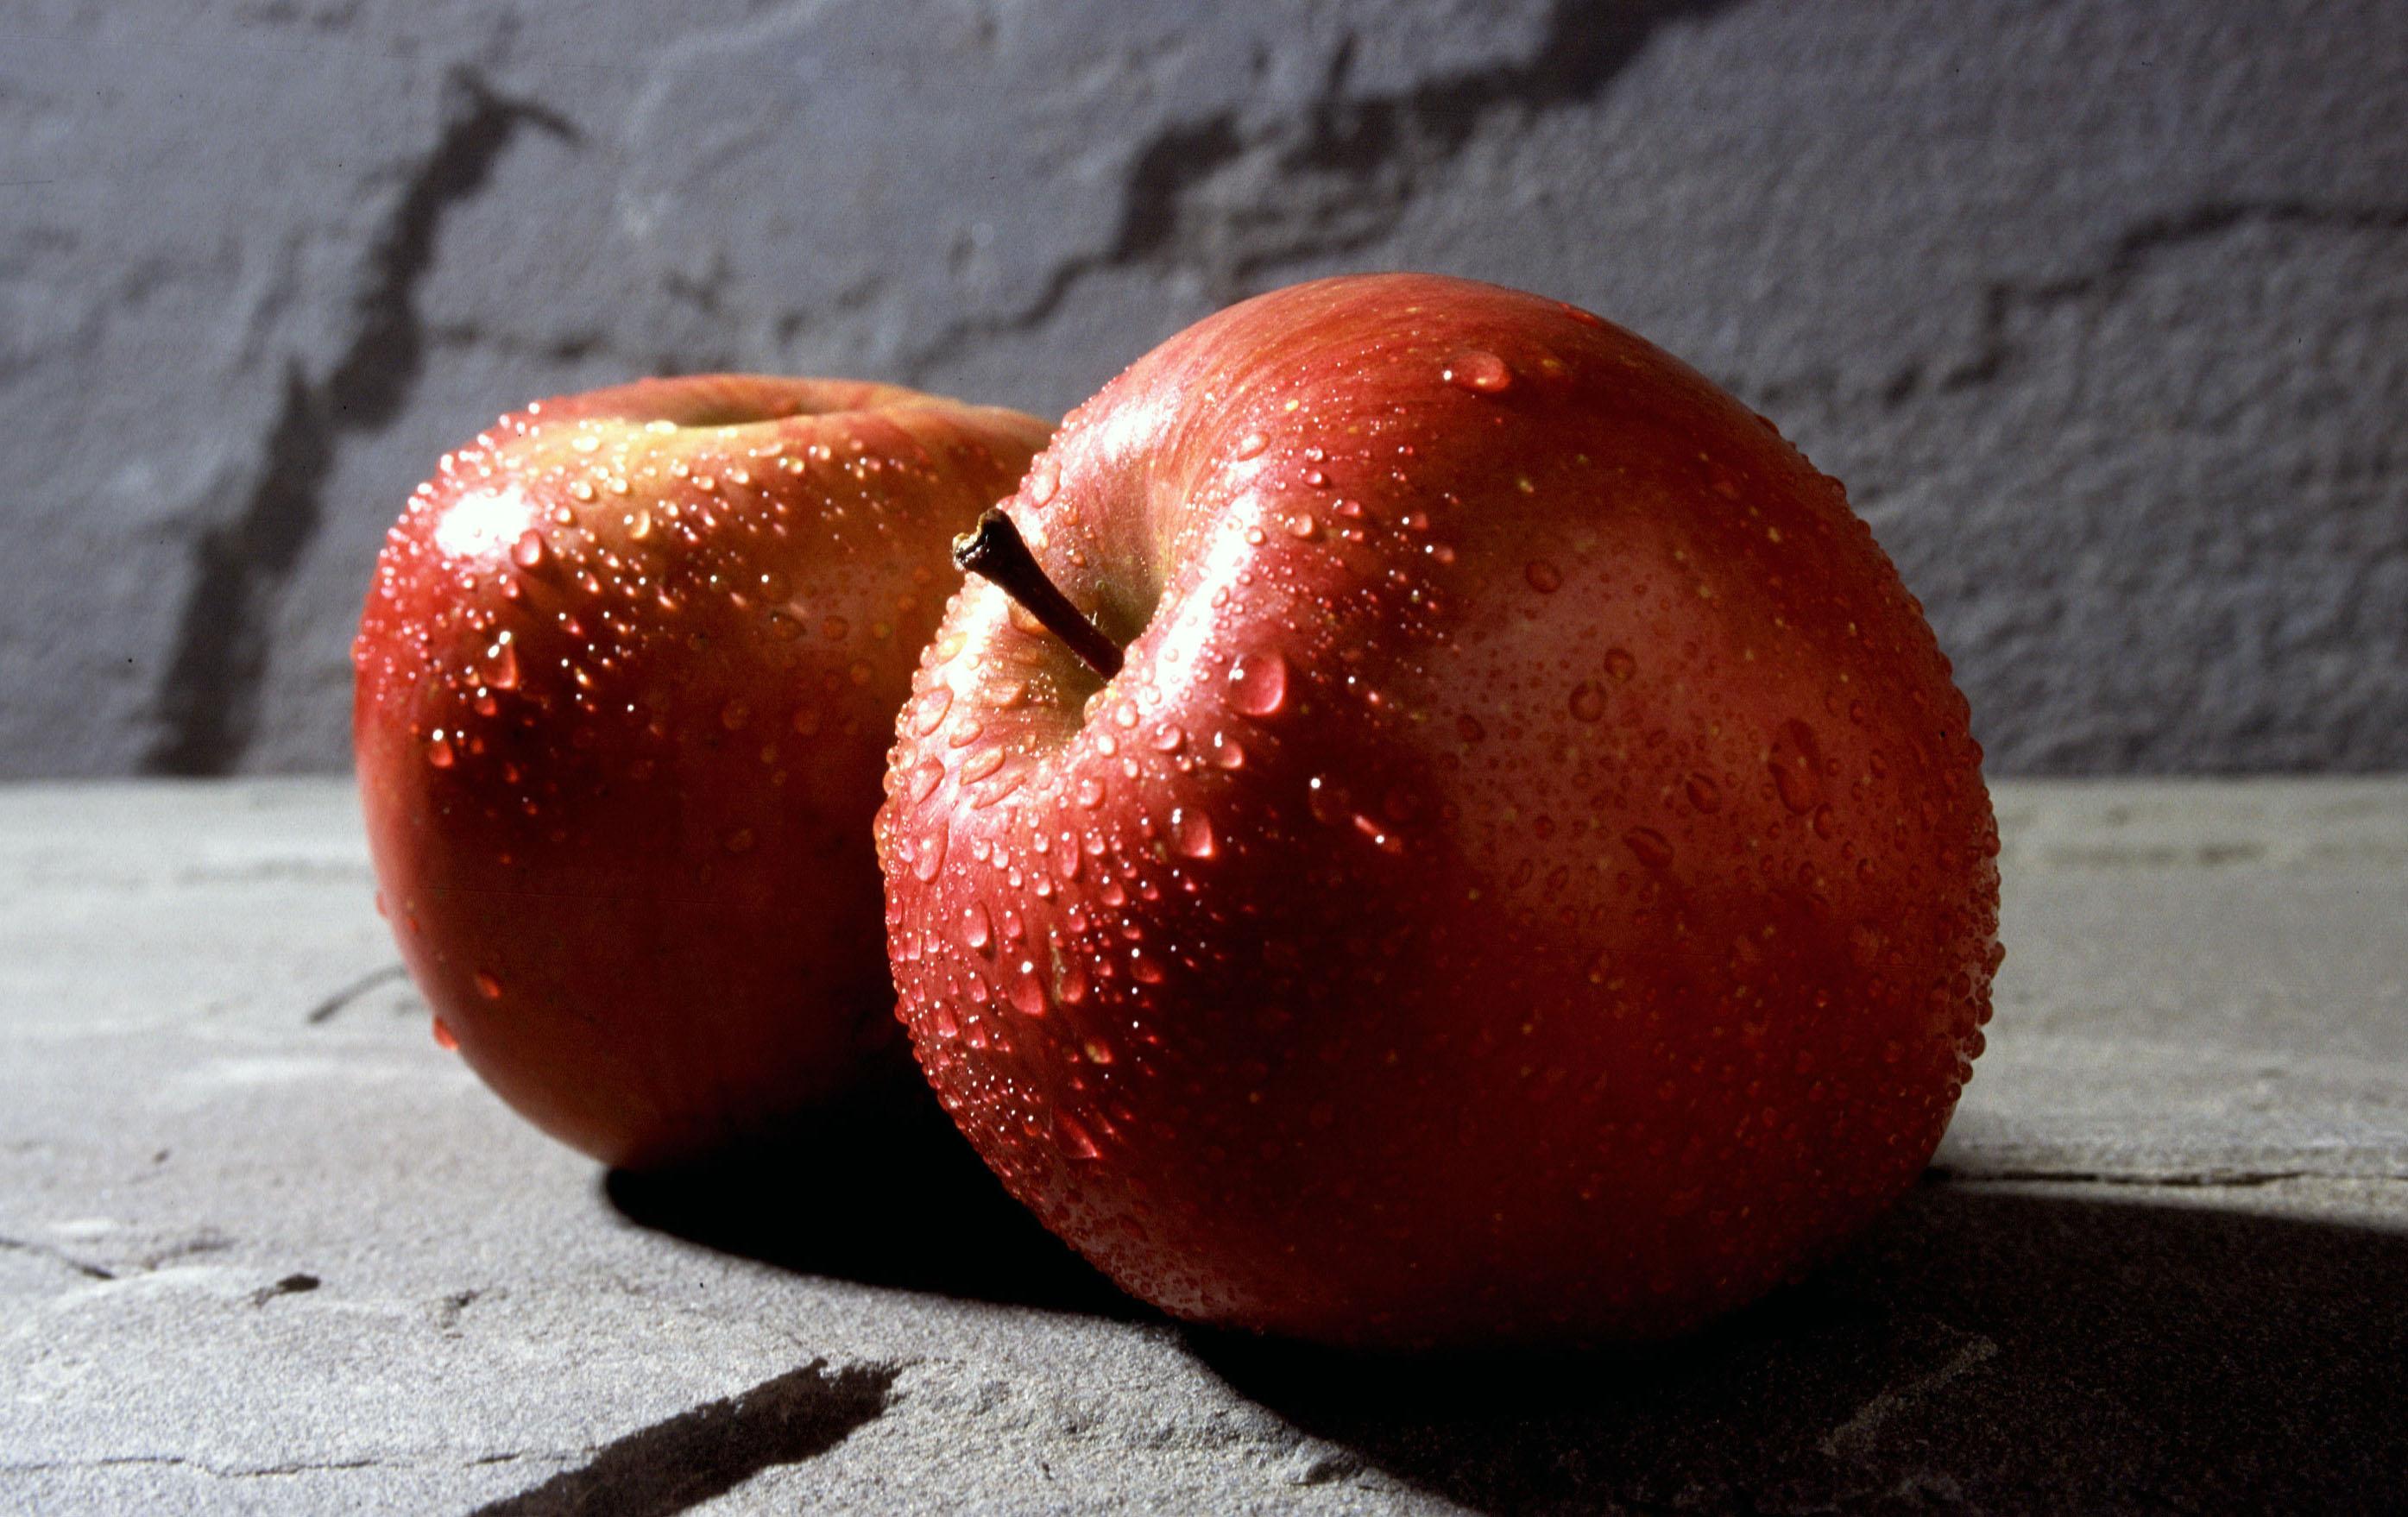 https://i0.wp.com/upload.wikimedia.org/wikipedia/commons/c/c1/Fuji_apple.jpg